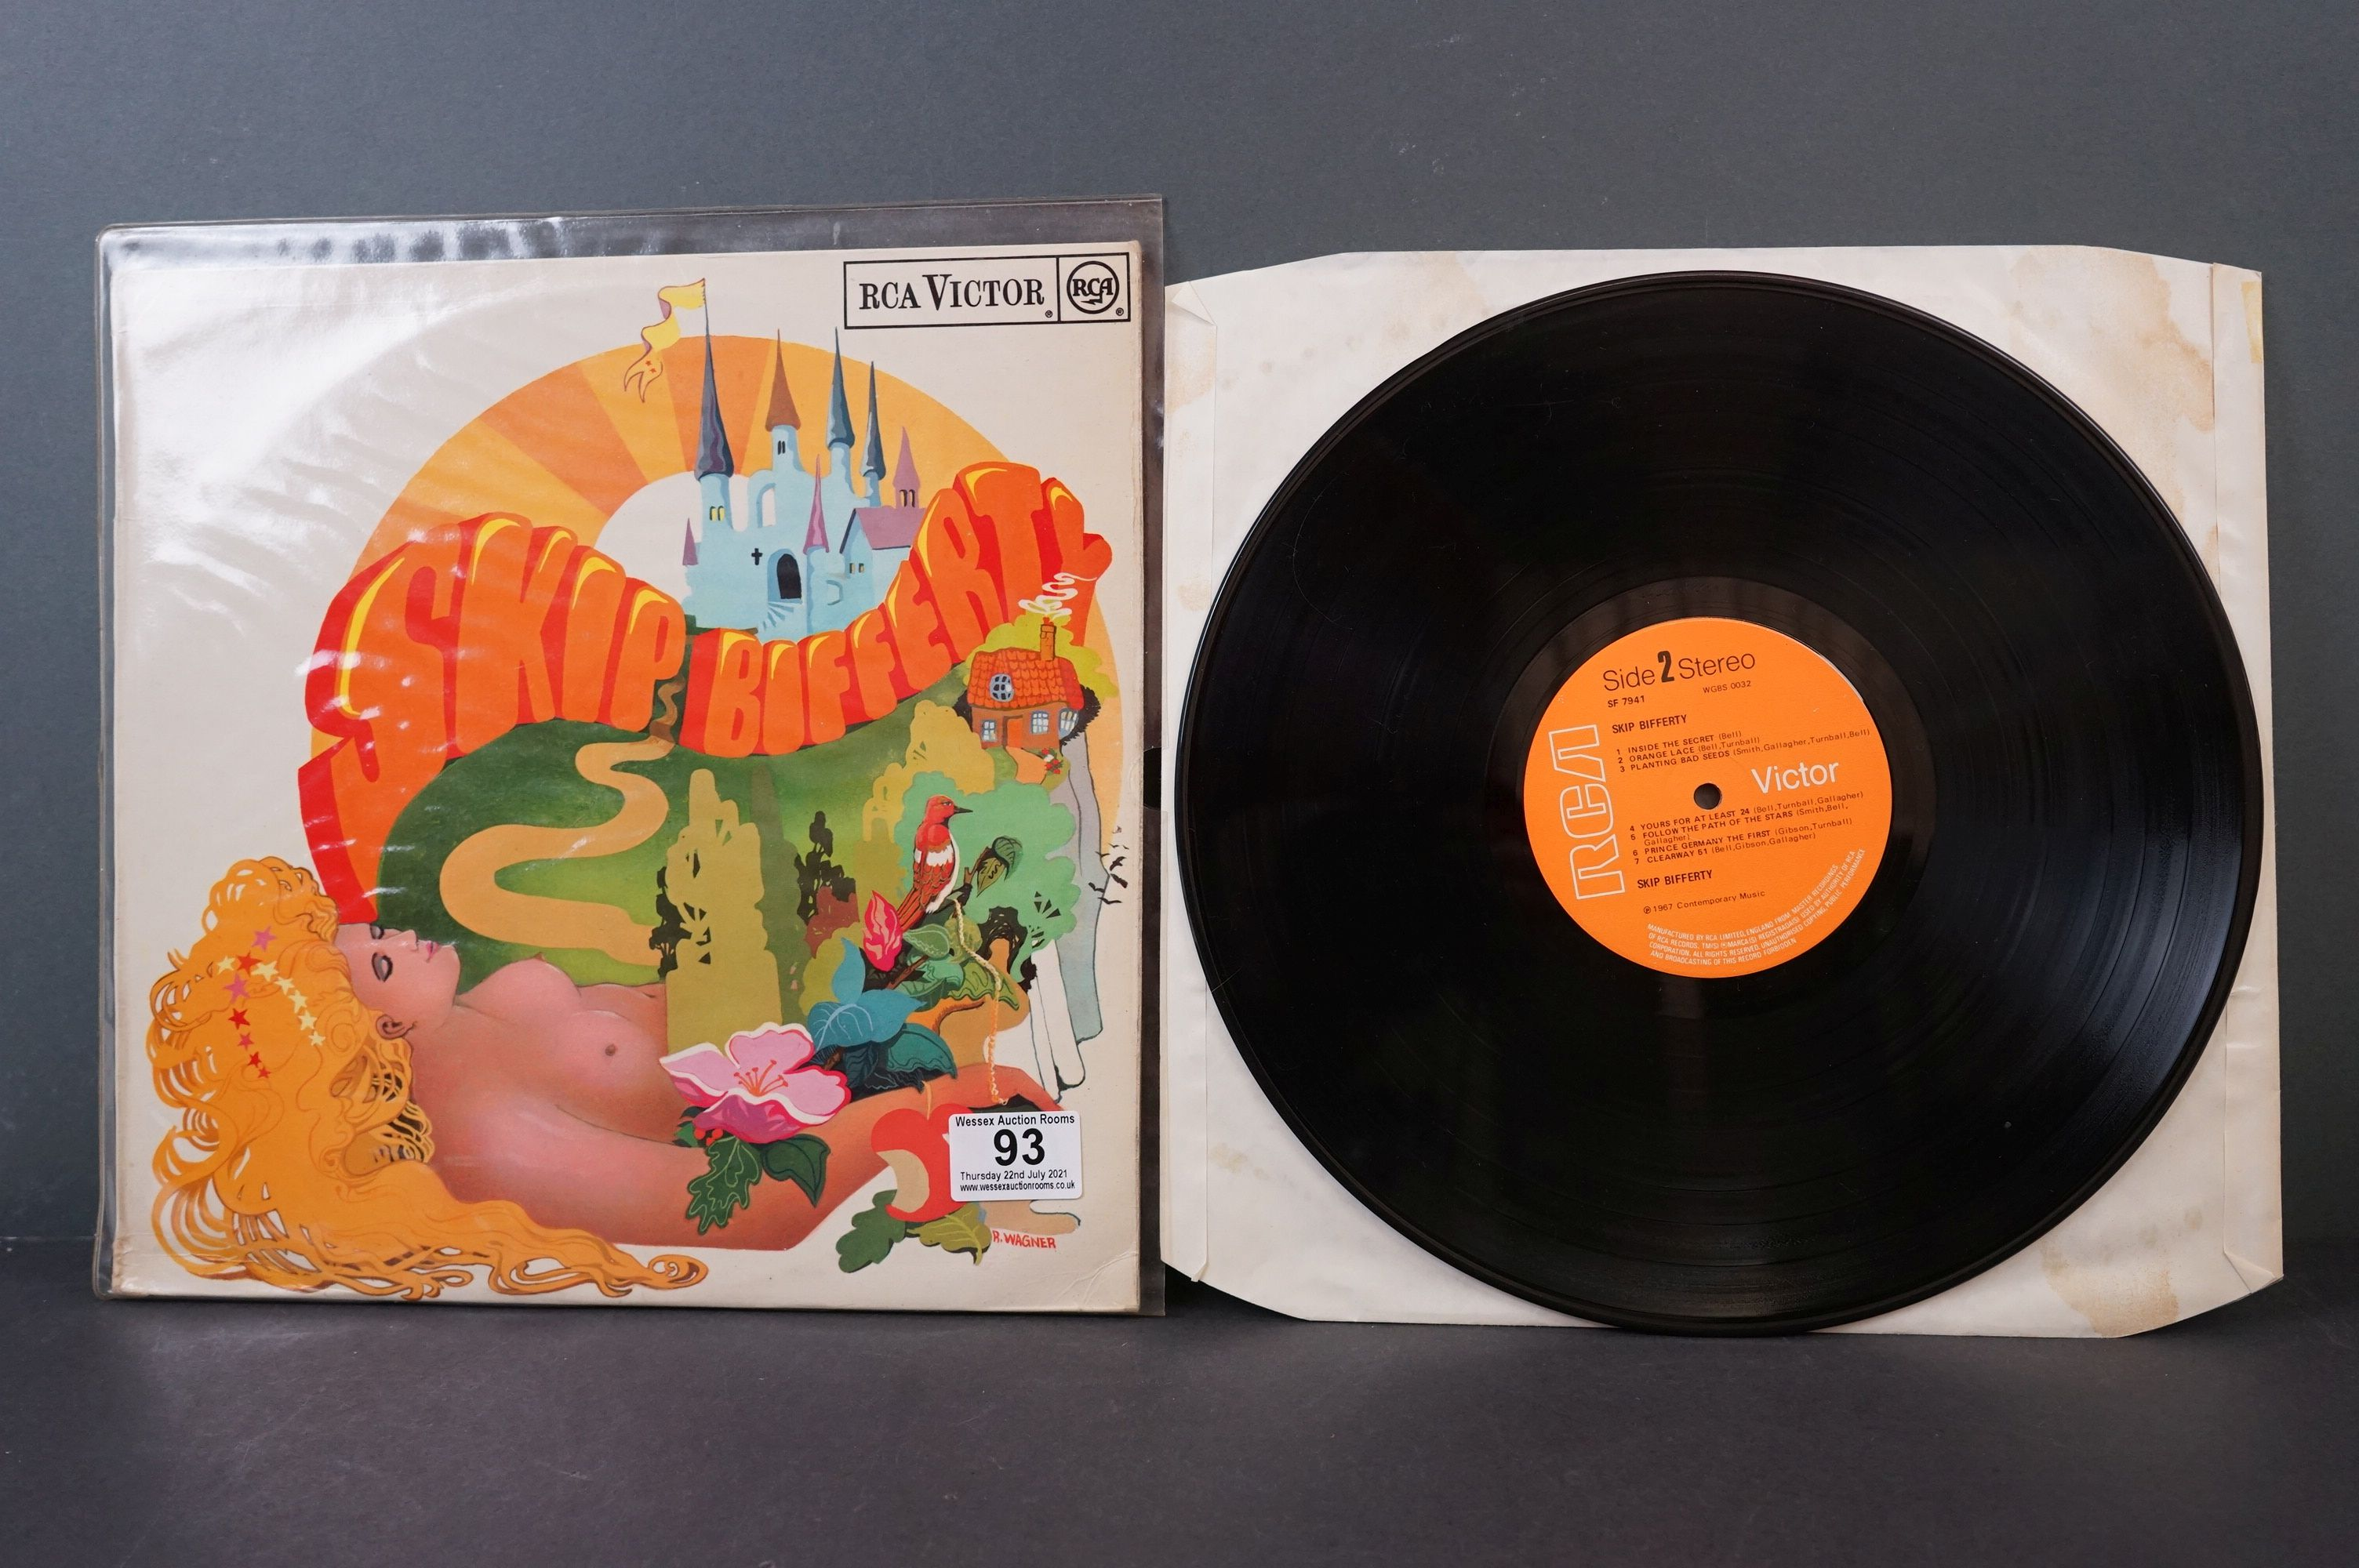 Vinyl - Psych - Skip Bifferty - Skip Bifferty (1968 UK, RCA Records, Orange labels, Stereo Copy) vg+ - Image 2 of 3